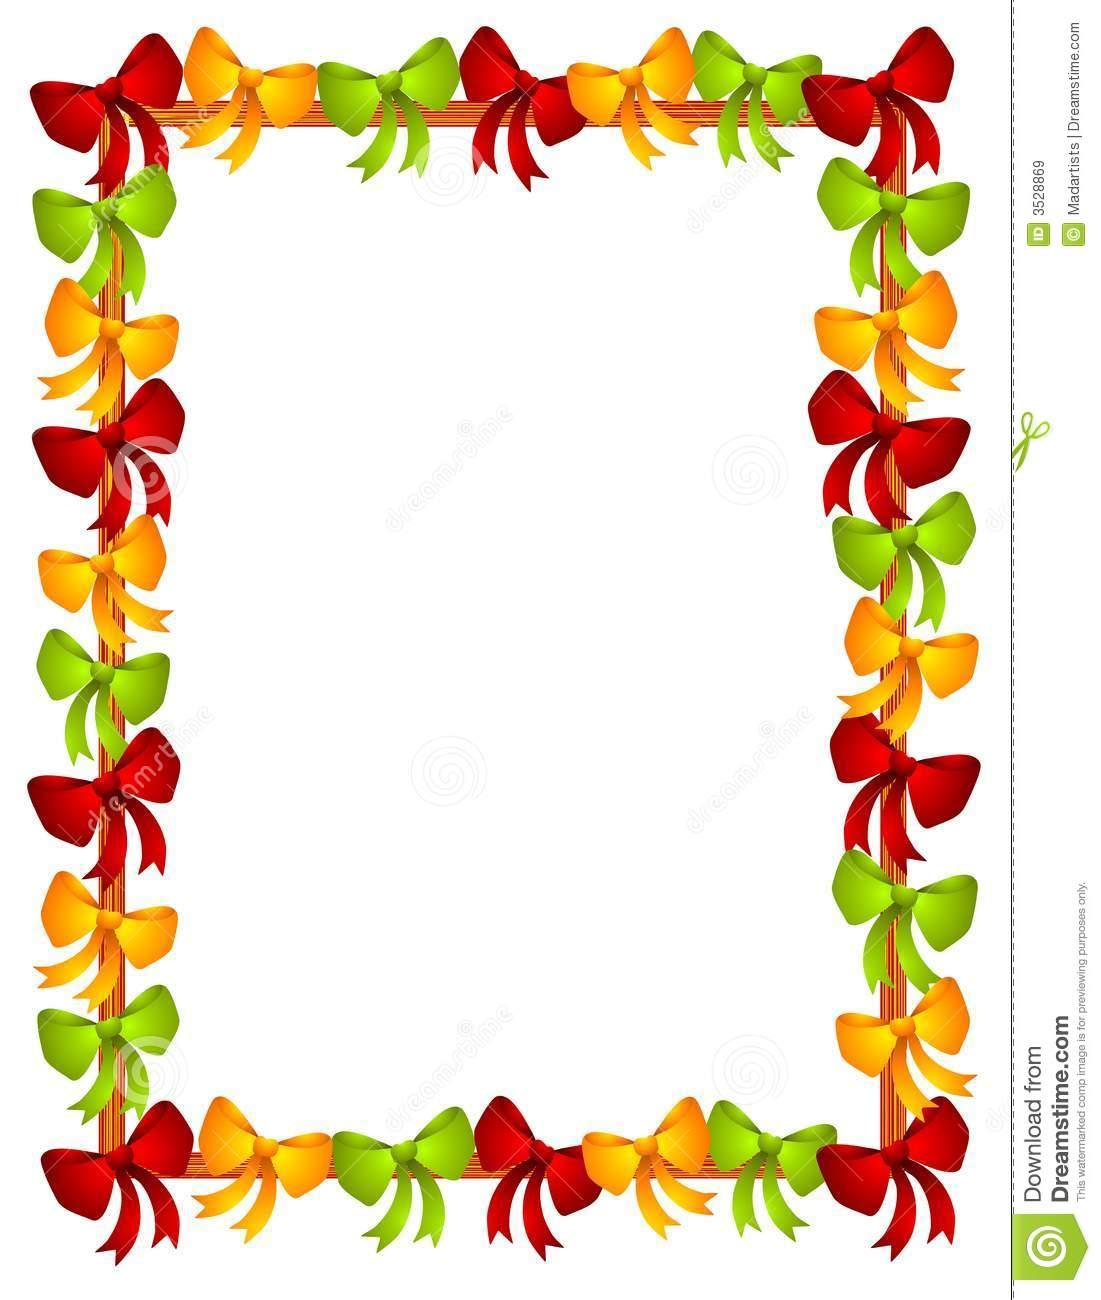 Christmas Clipart Borders Free .-Christmas Clipart Borders Free .-2